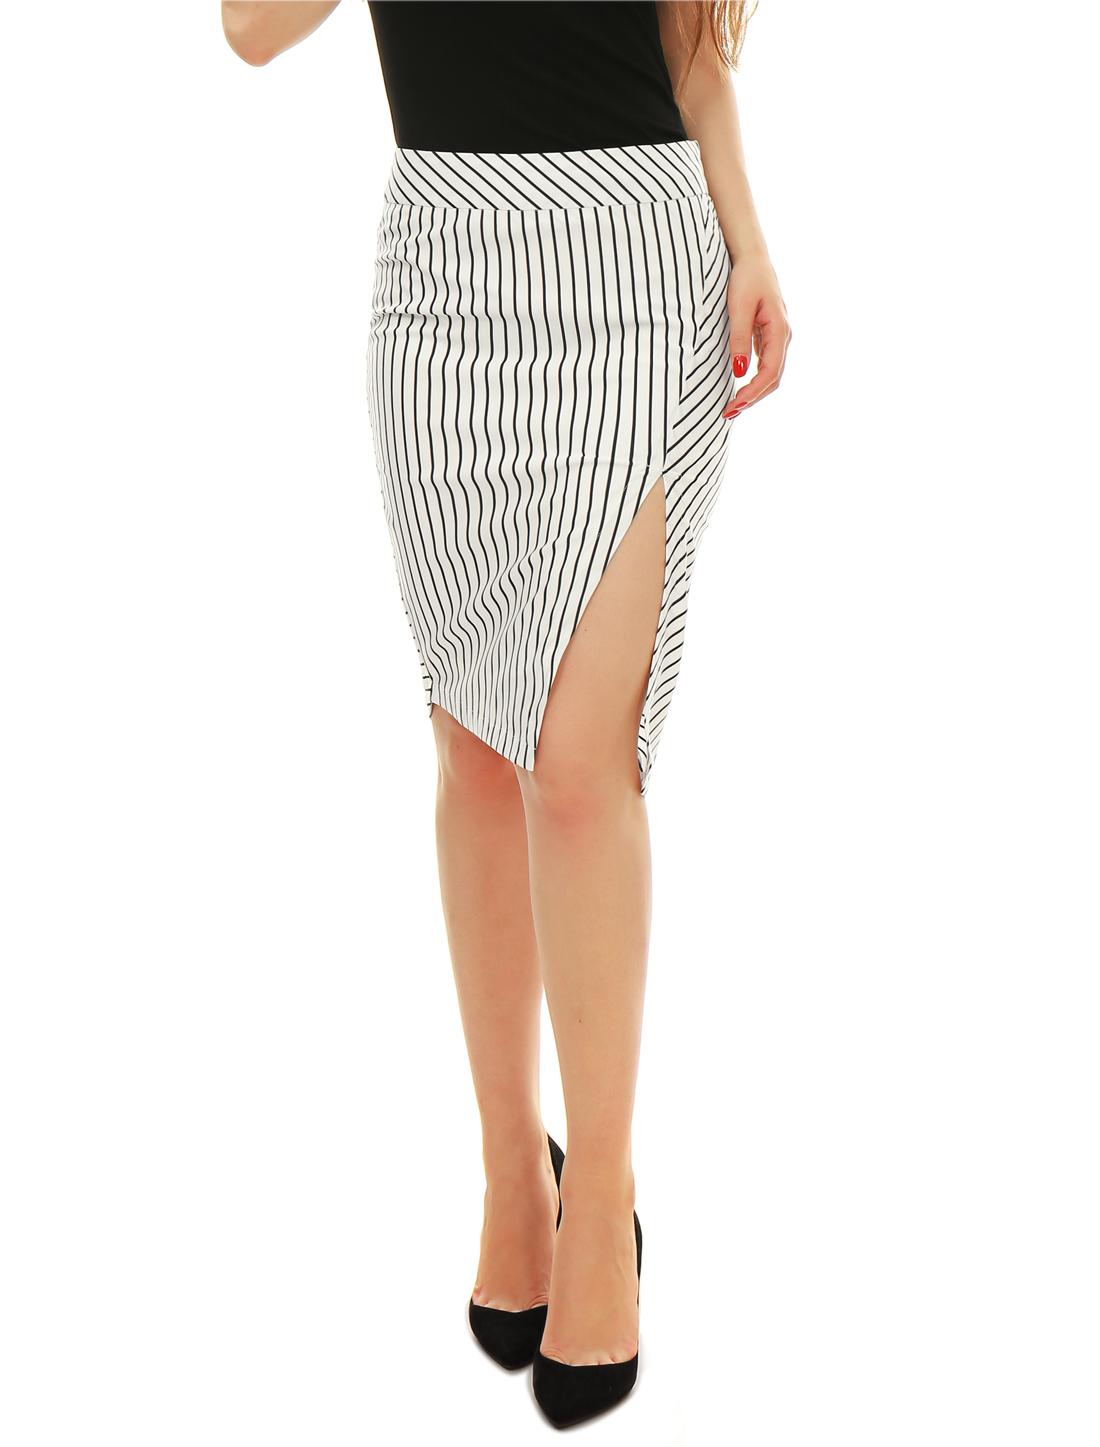 Woman Stripes Split Front Fully Lined Pencil Skirt Black White S